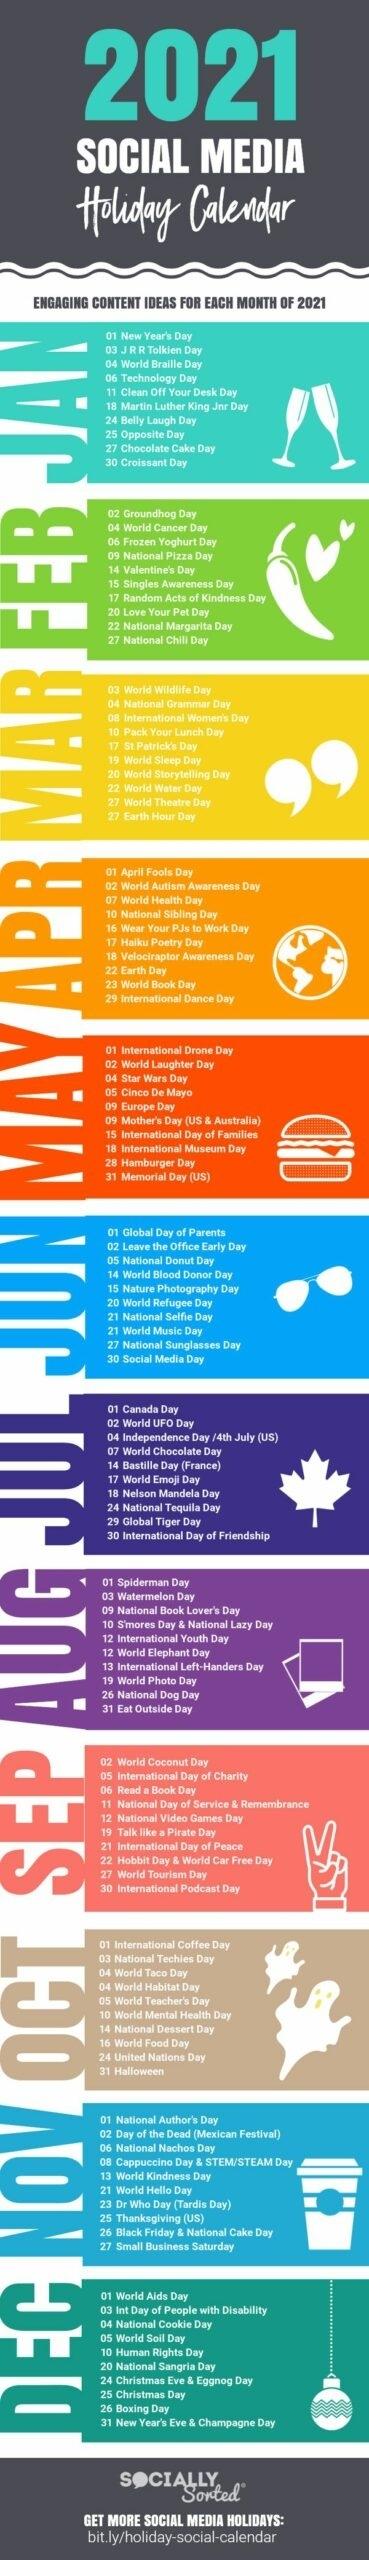 2021 Social Media Content Calendar Packed With Post Ideas National Awareness Calendar For 2021